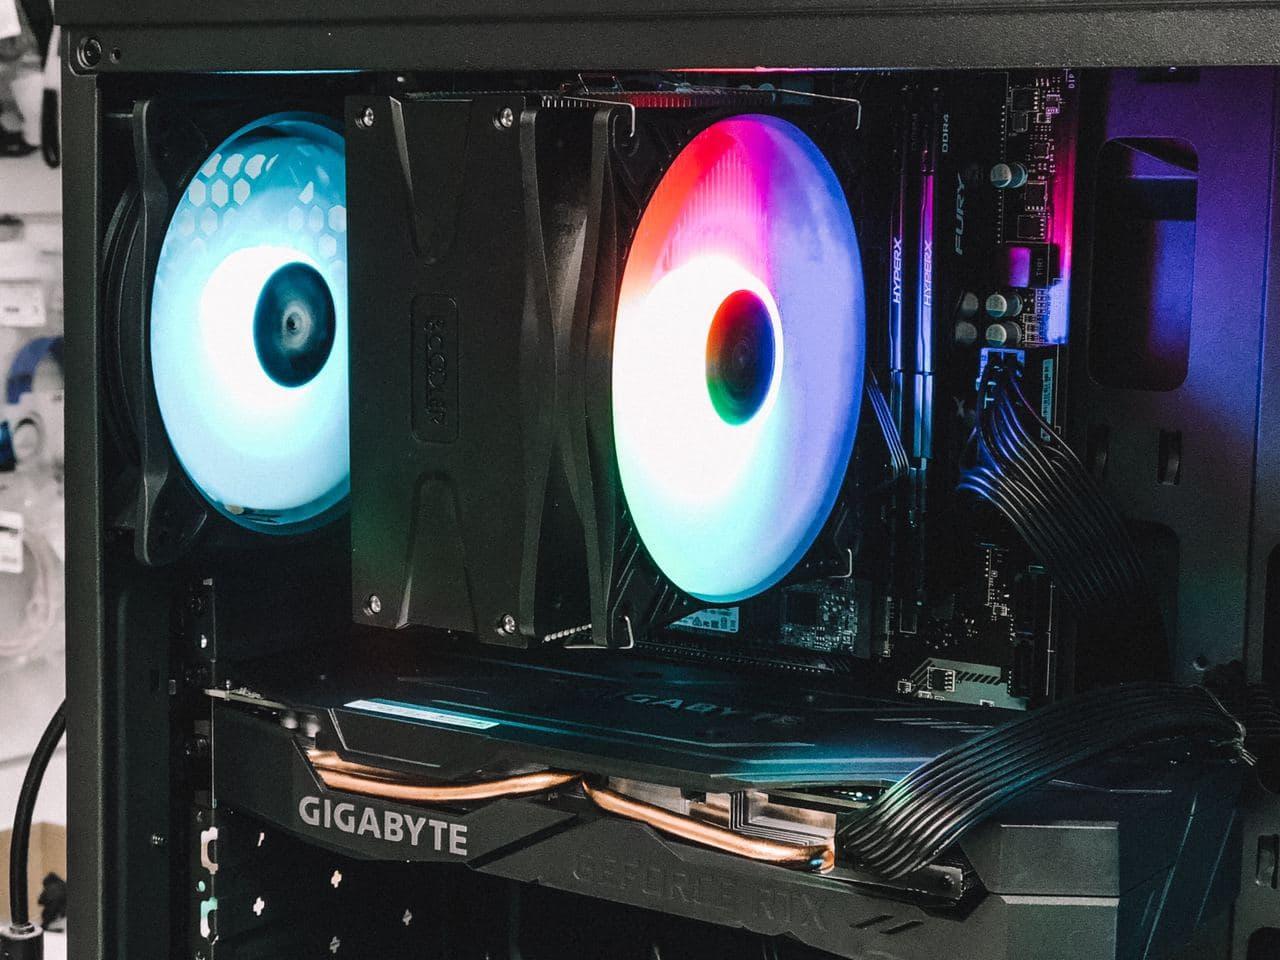 картинка Системный блок Status Home Ryzen 5 AMD + GeForce RTX2060 от магазина Одежда+